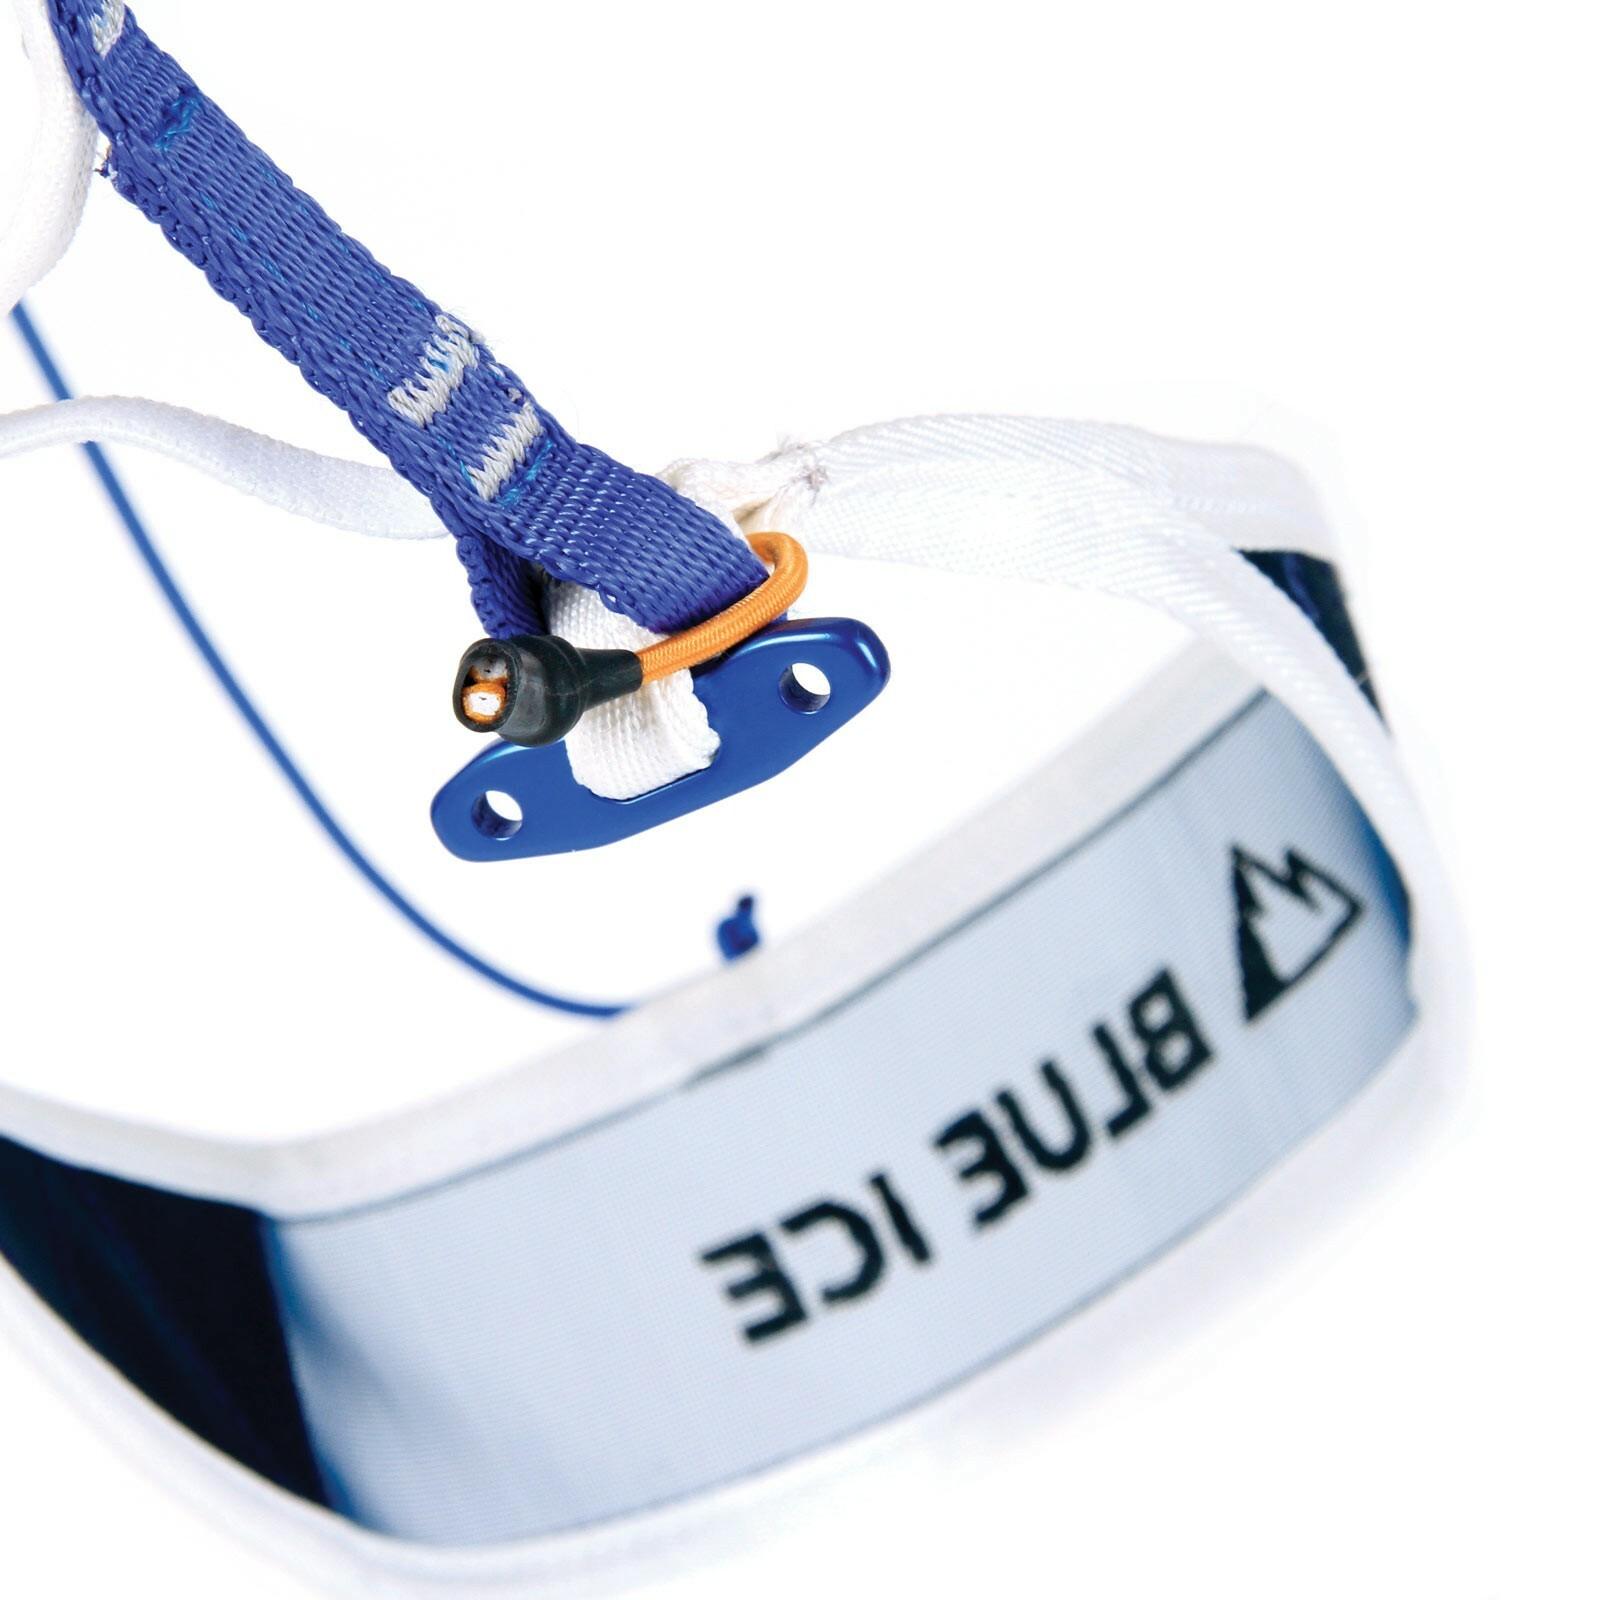 Klettergurt Blue Ice Choucas Harness